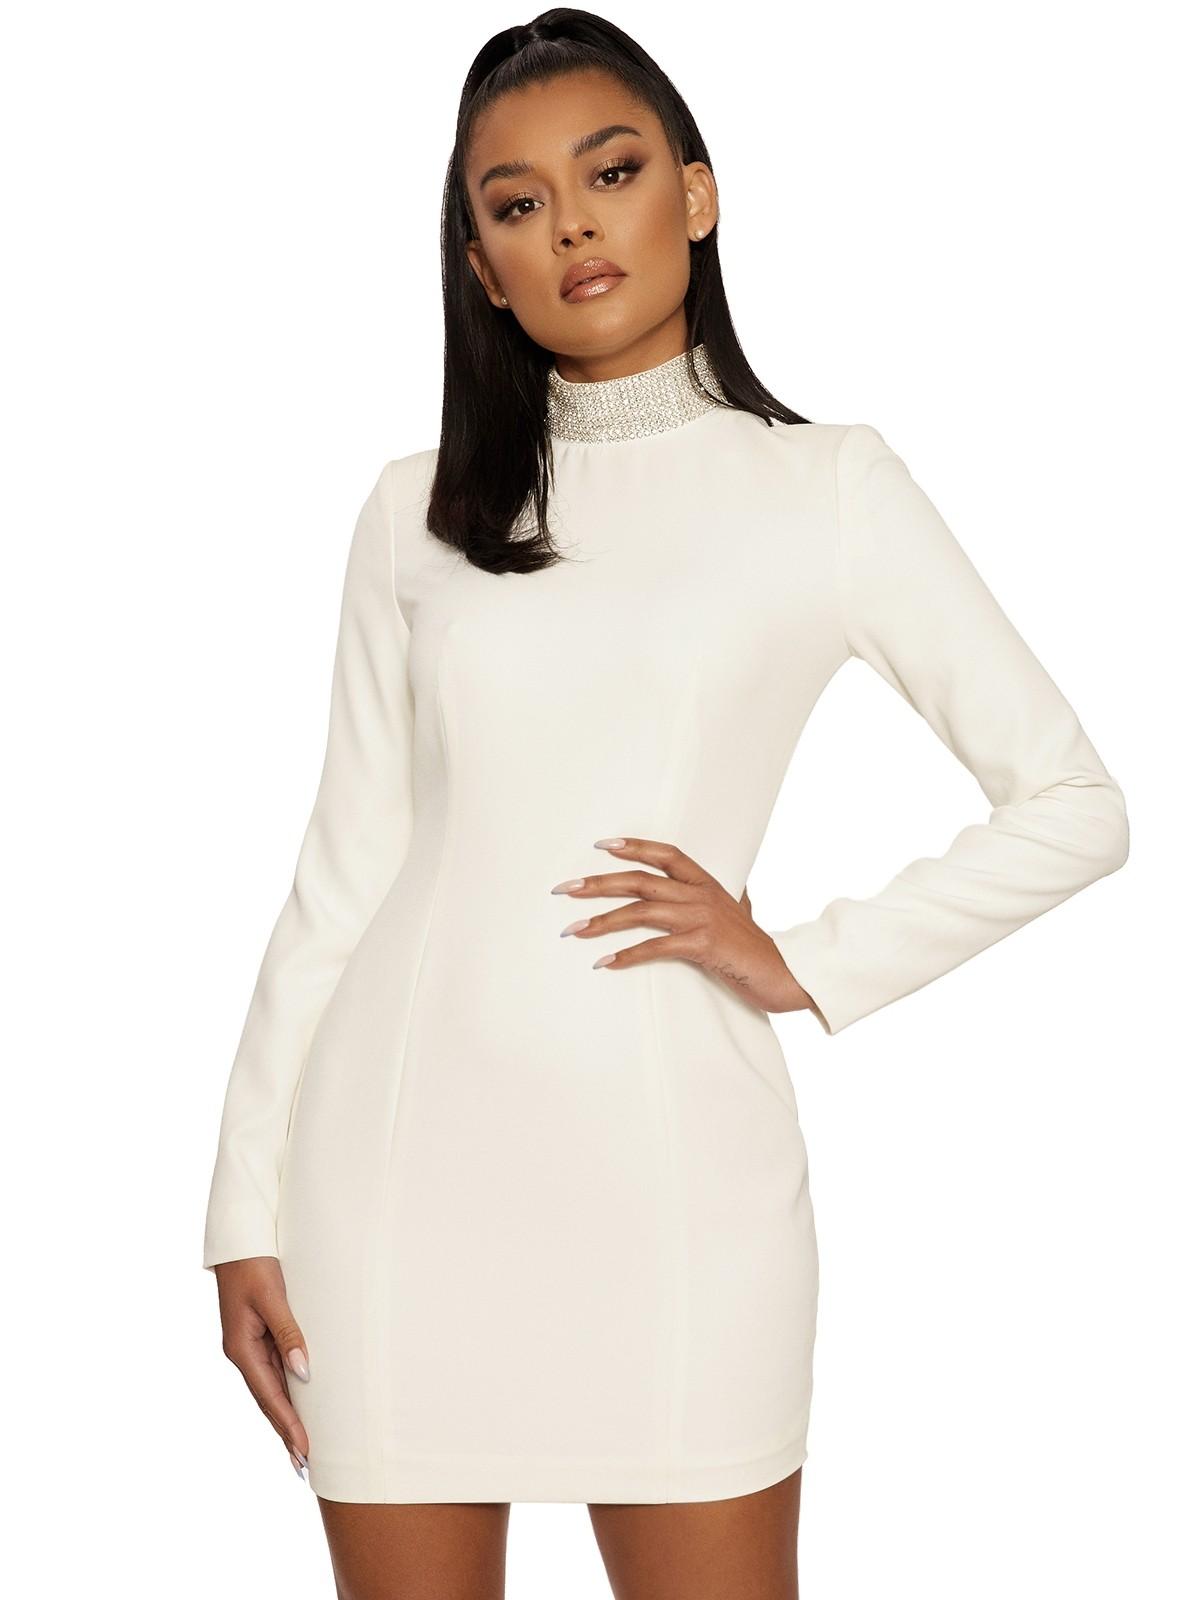 Put A Bling On It Mini Dress by Naked Wardrobe, available on nakedwardrobe.com for $74 Kylie Jenner Dress SIMILAR PRODUCT